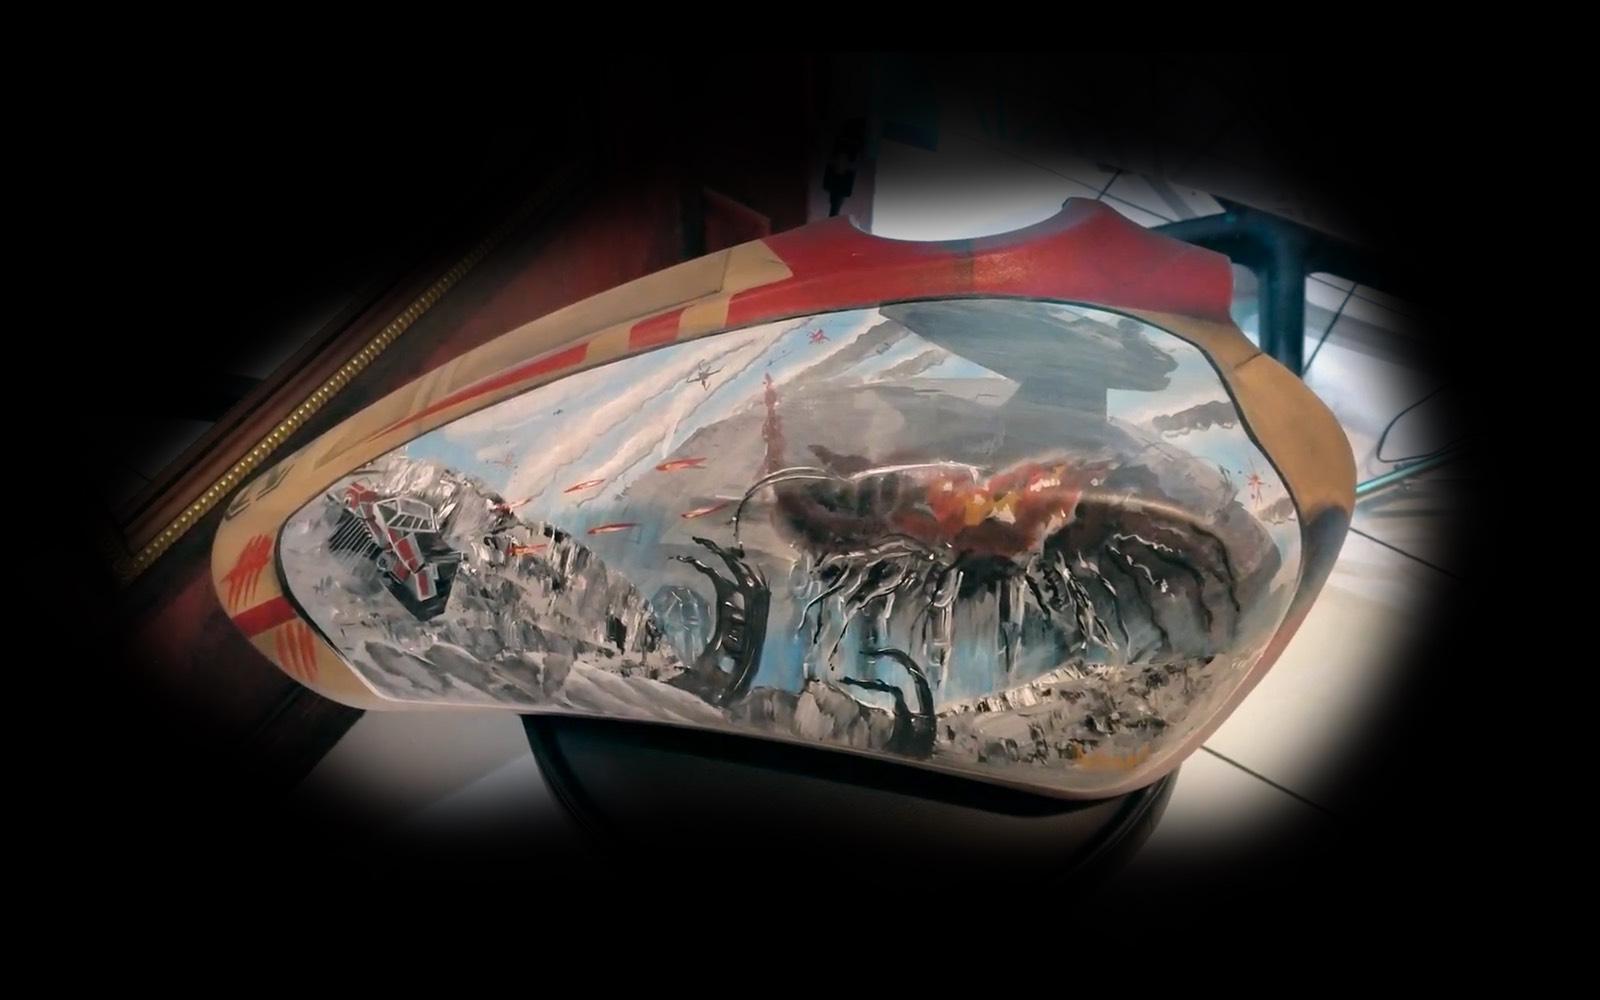 Star Wars Indian Motorcycle tank art by  Adam Natonio